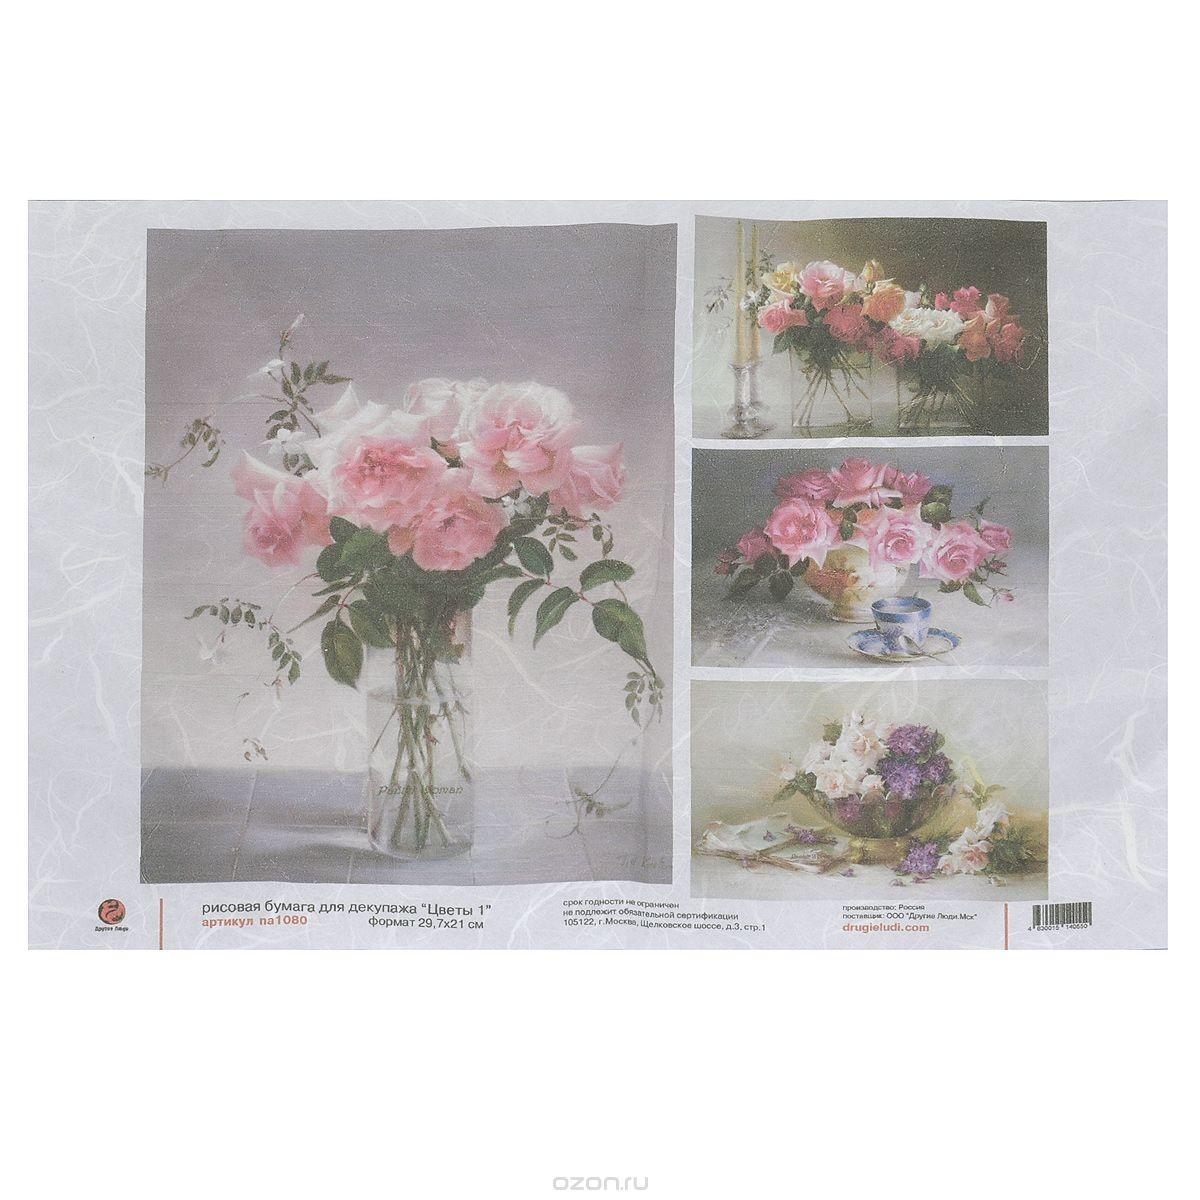 Рисовая бумага для декупажа Цветы 1